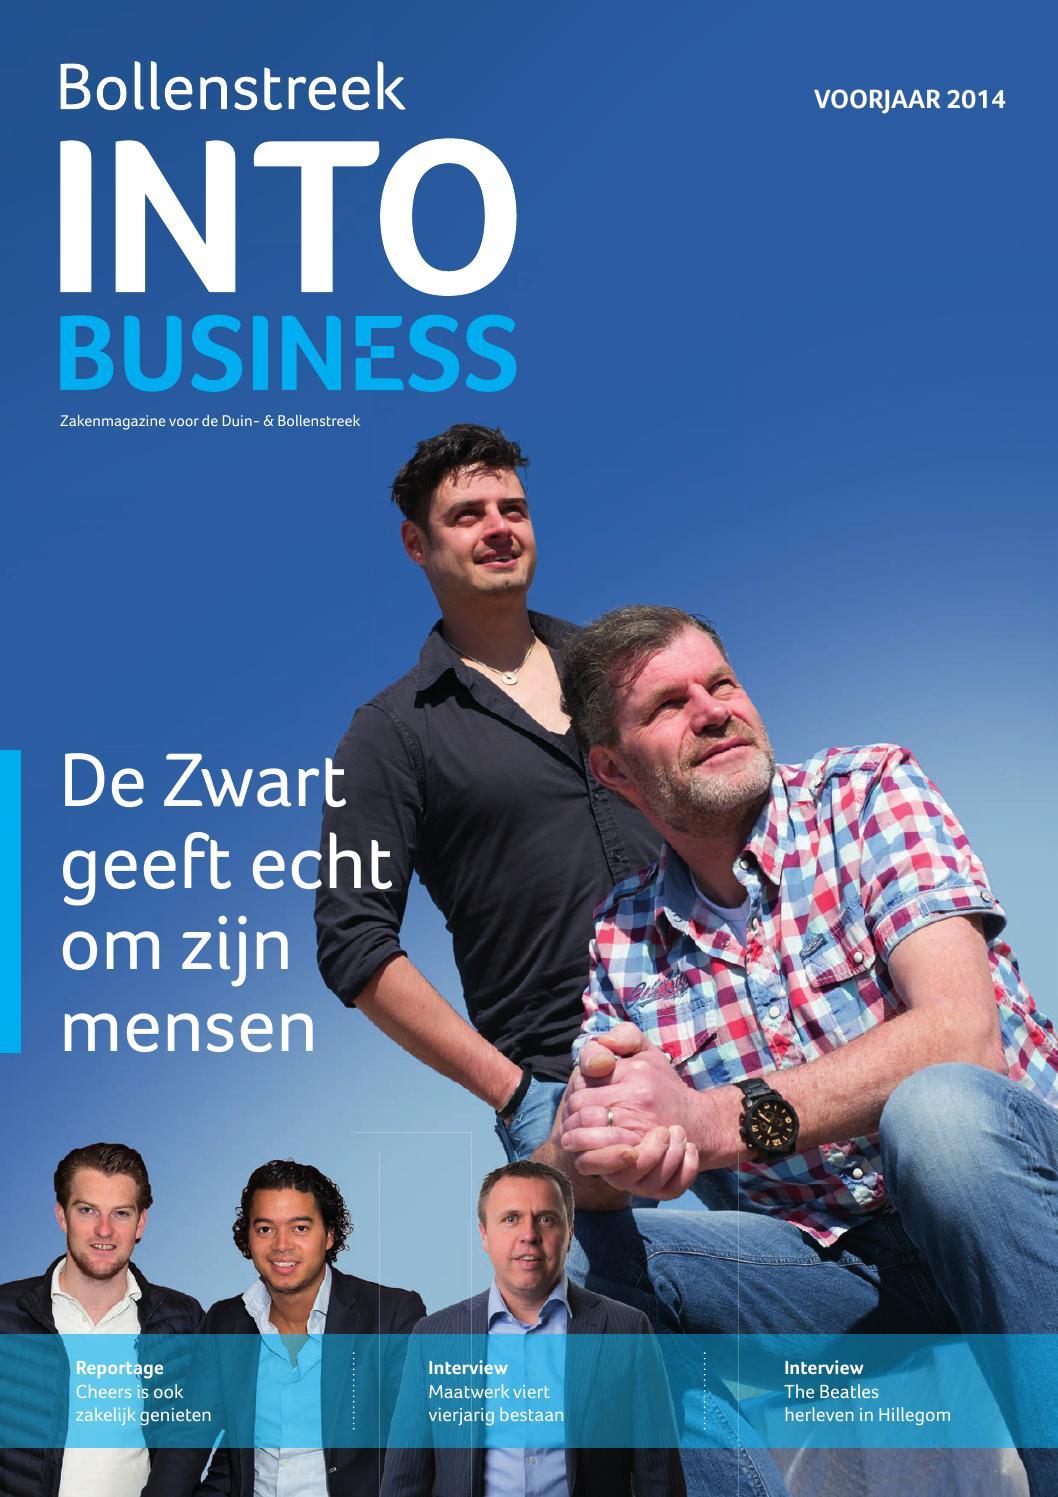 Bollenstreek IntoBusiness voorjaar 2014 by INTO Business - issuu